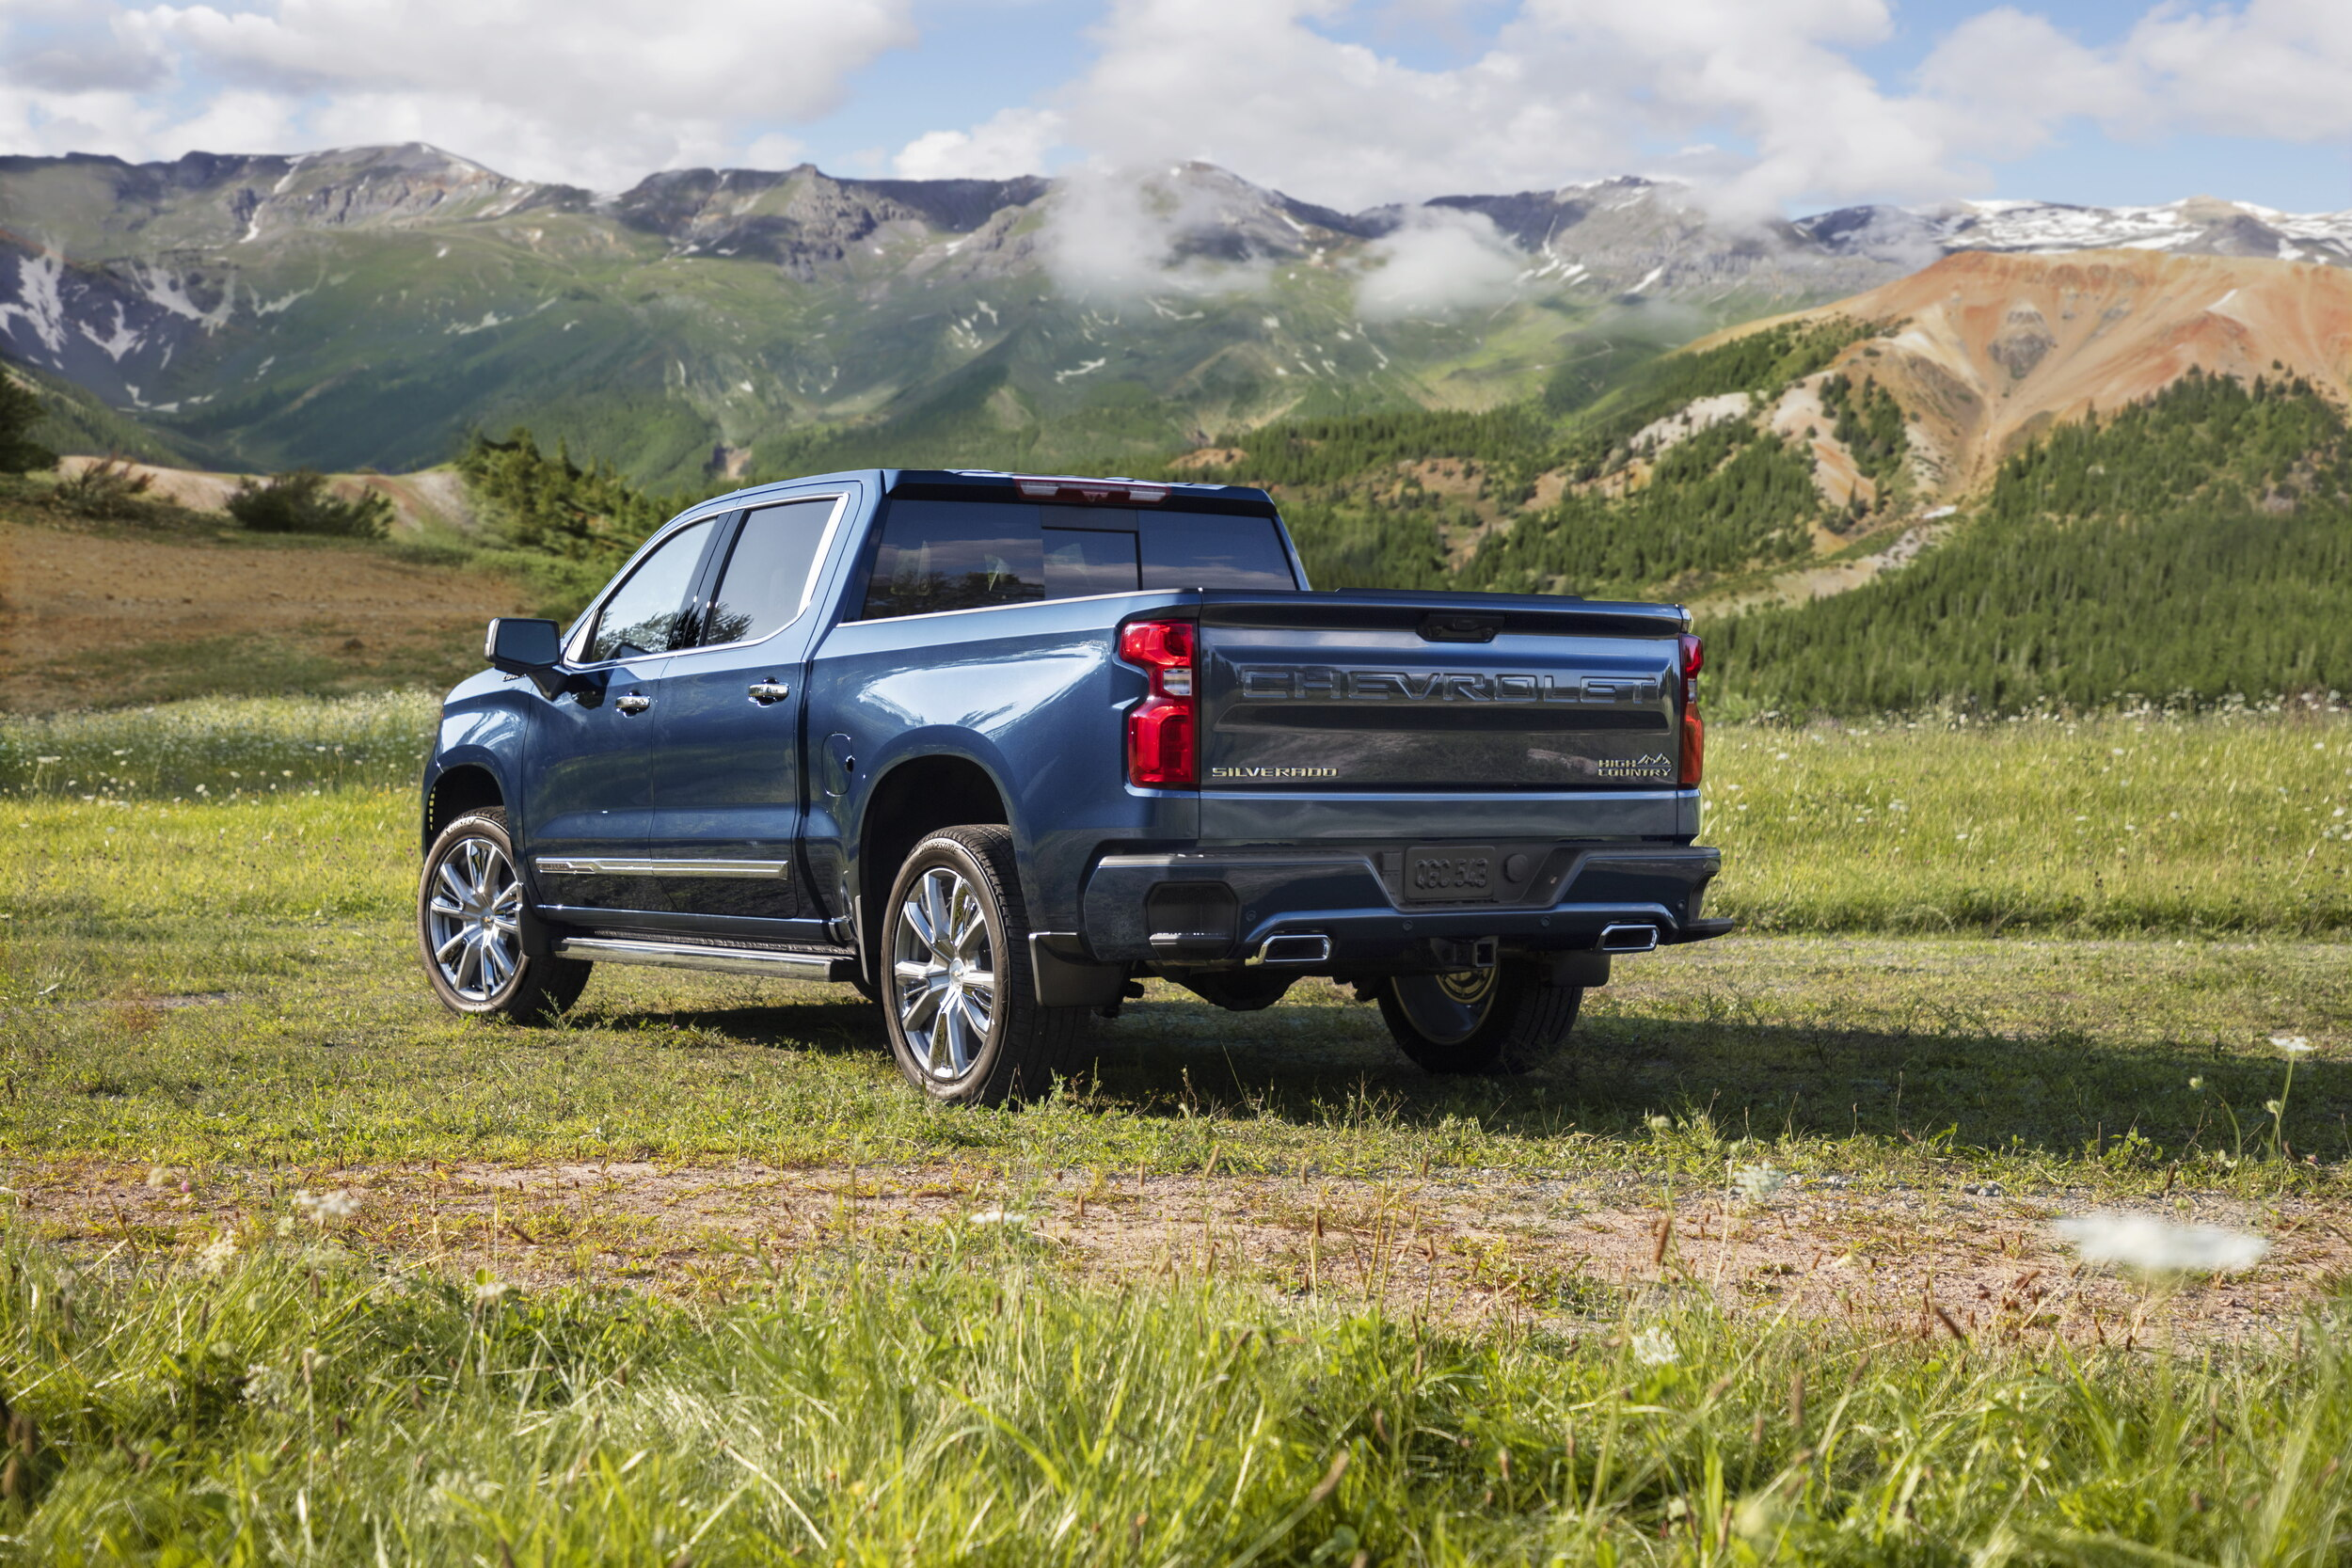 Chevrolet Silverado High Country 2022